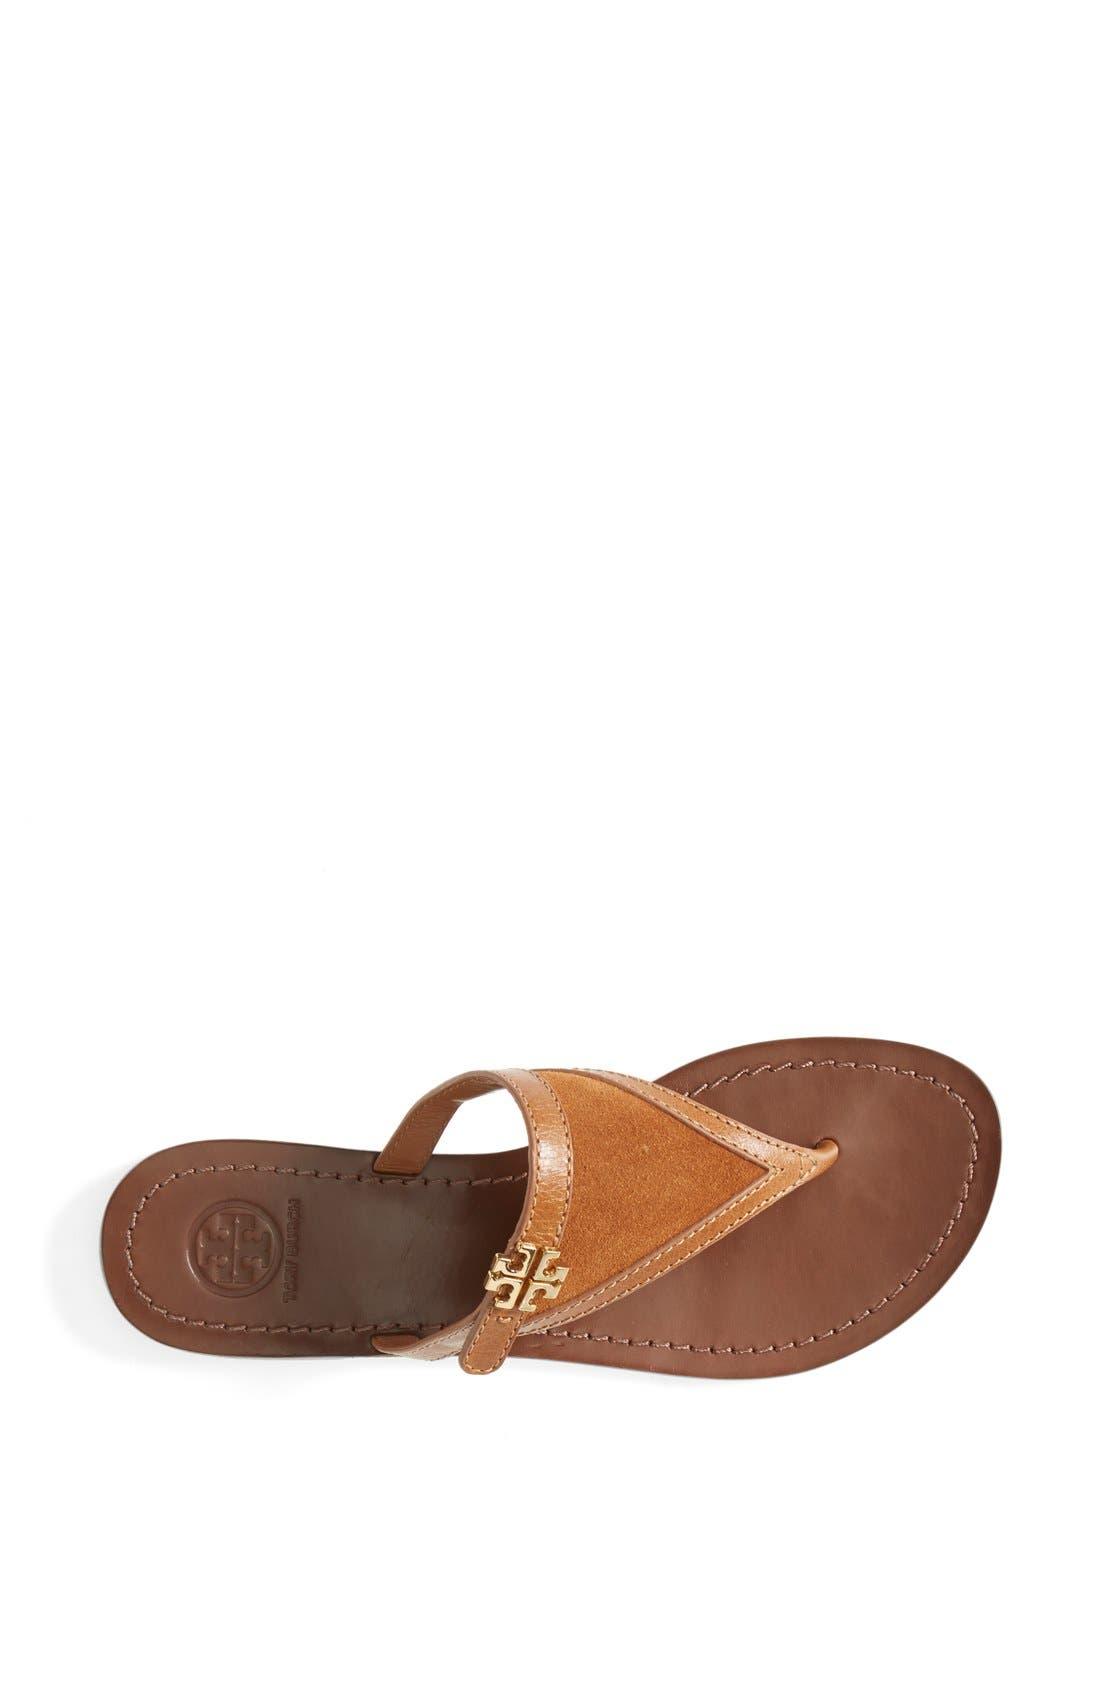 Alternate Image 3  - Tory Burch 'Eloise' Flat Thong Sandal (Nordstrom Exclusive) (Women)